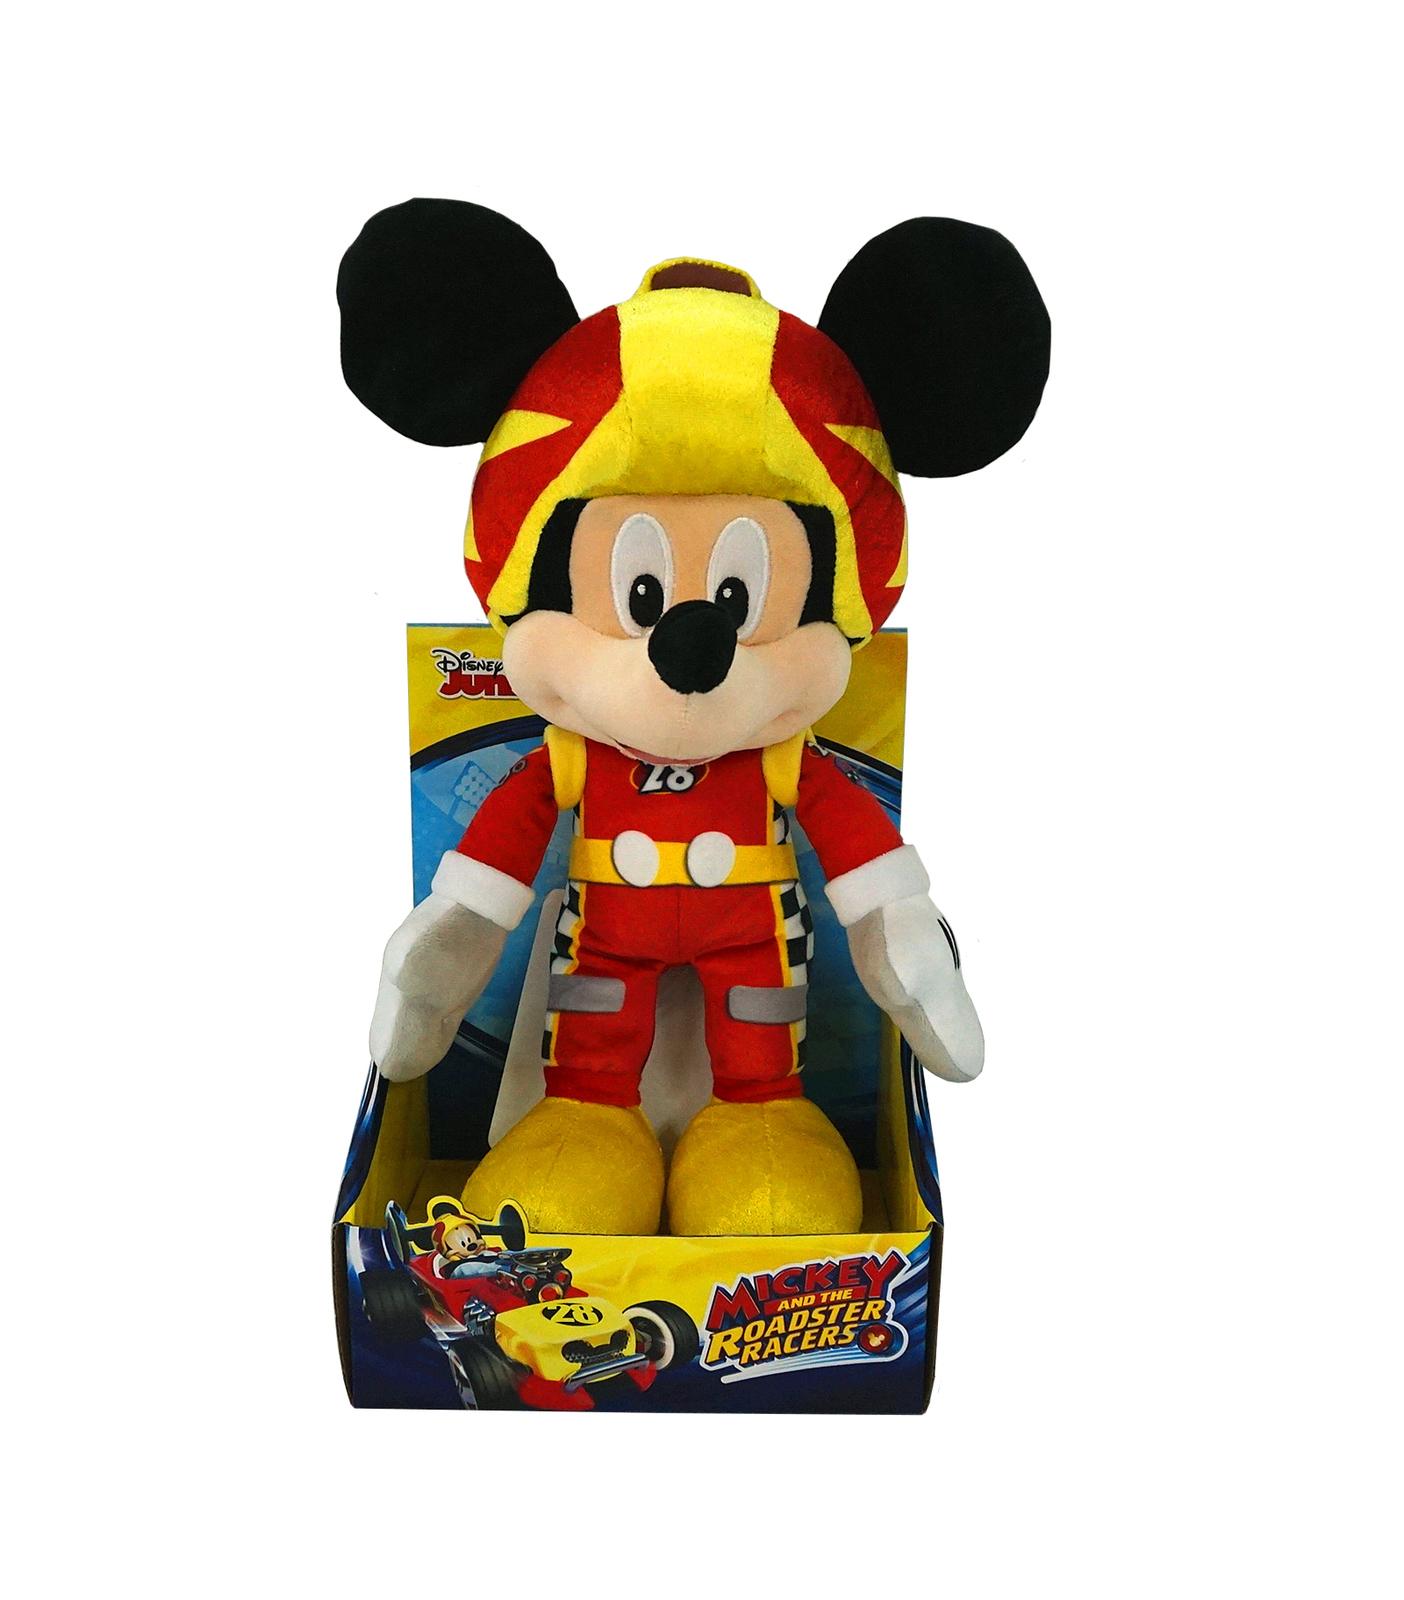 Mickey Mouse Plush image